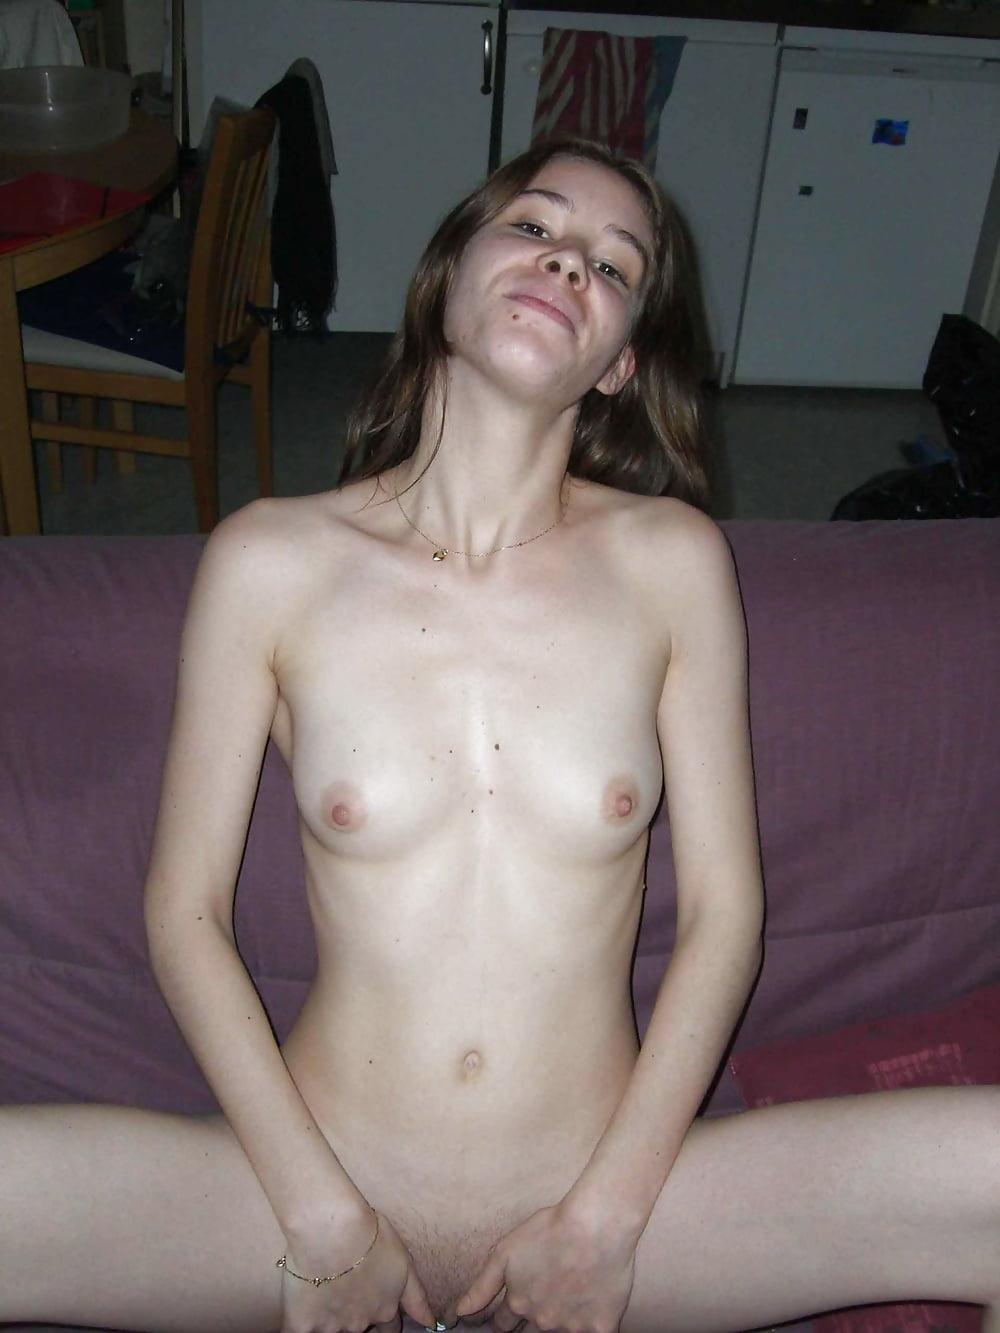 Amateur girlfriend small boobs